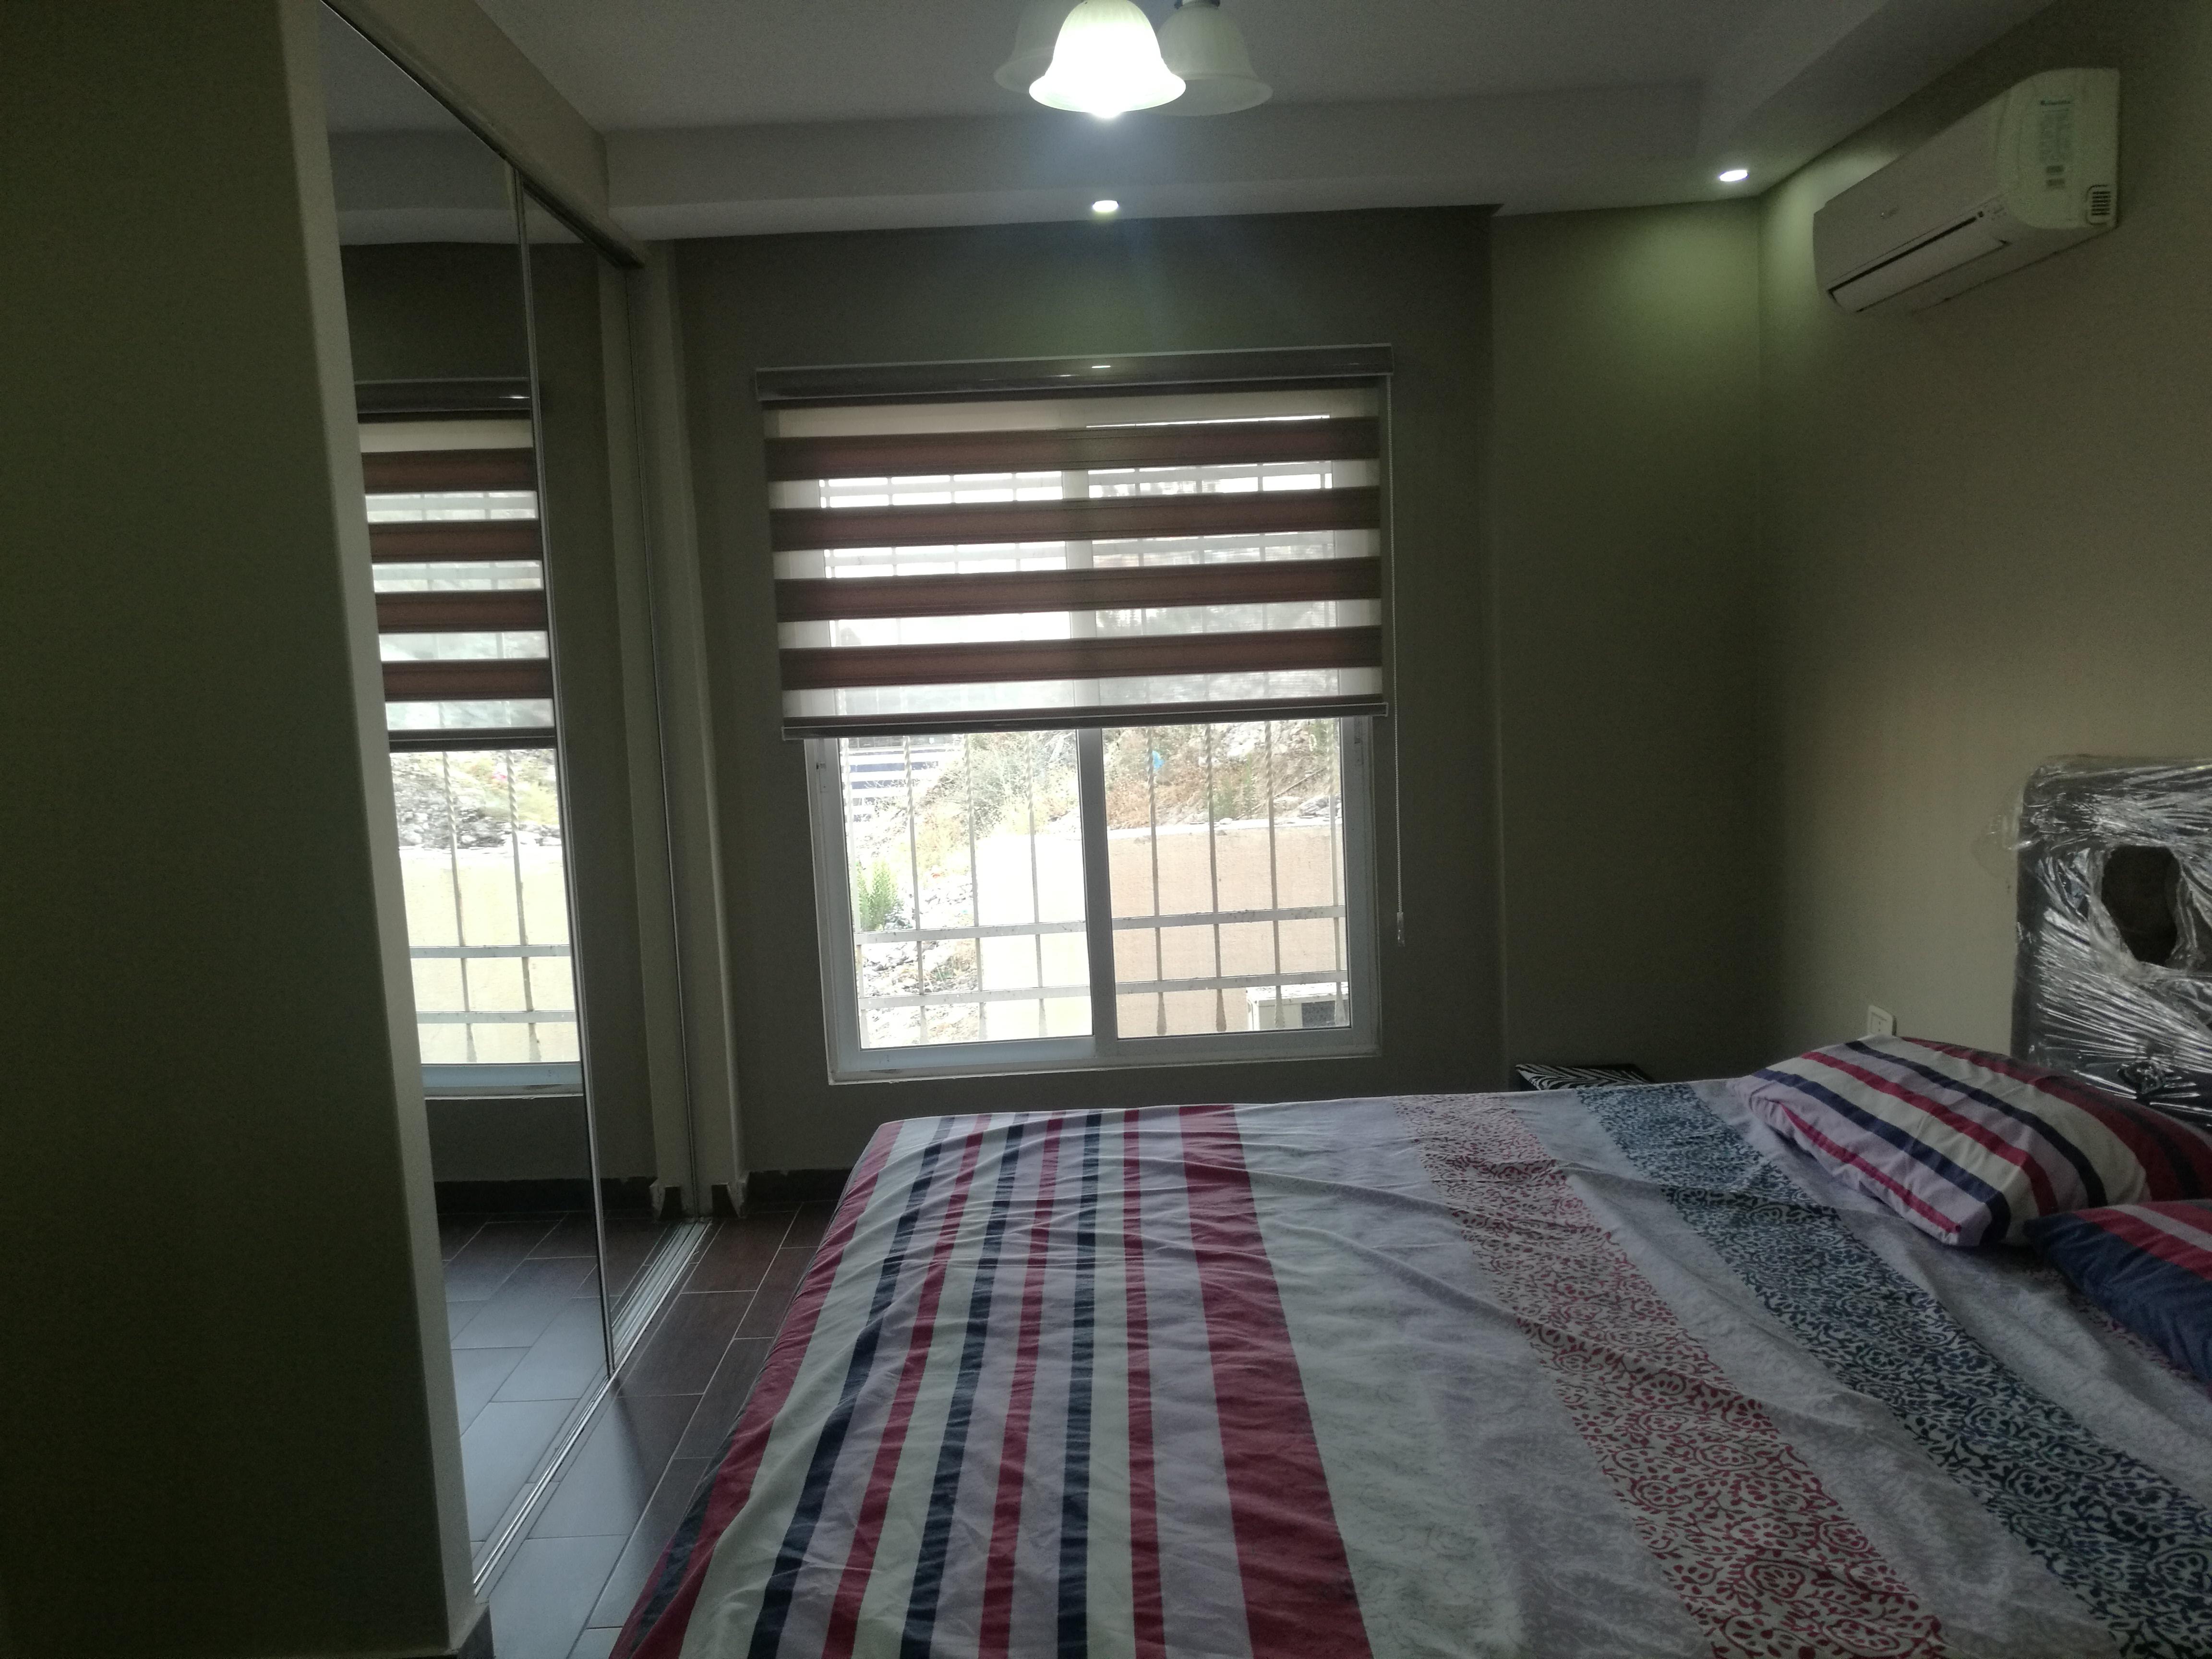 Elegant 02 Bedrooms at Executive Tower-  استوديو مفروش بحاله...